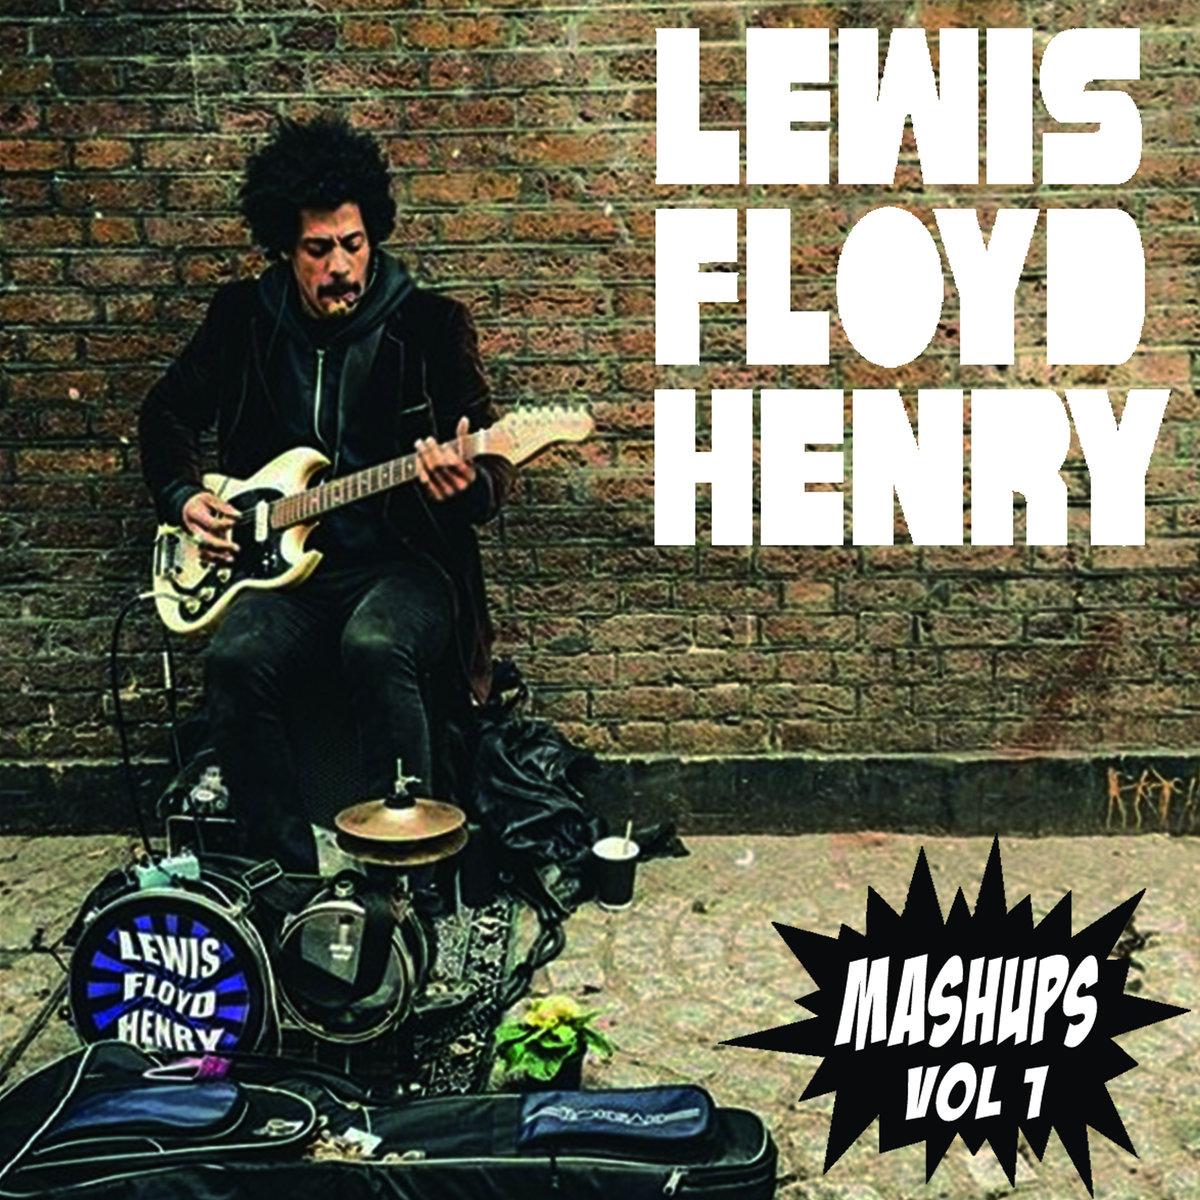 Lewis Floyd Henry Mashups